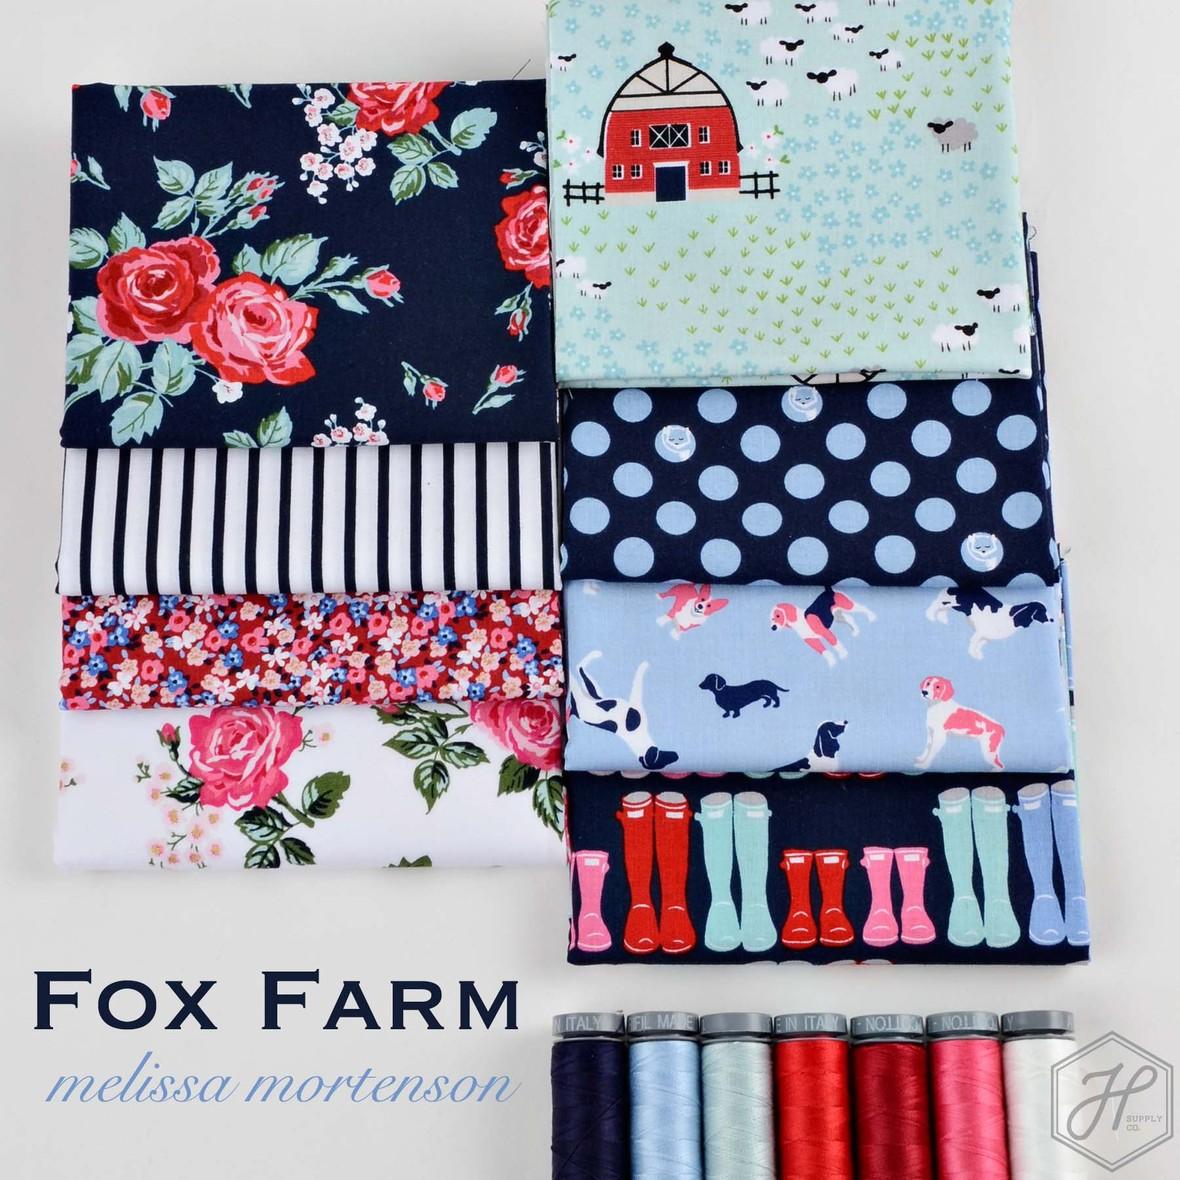 Fox Farm Melissa Mortenson at Hawthorne Supply Co